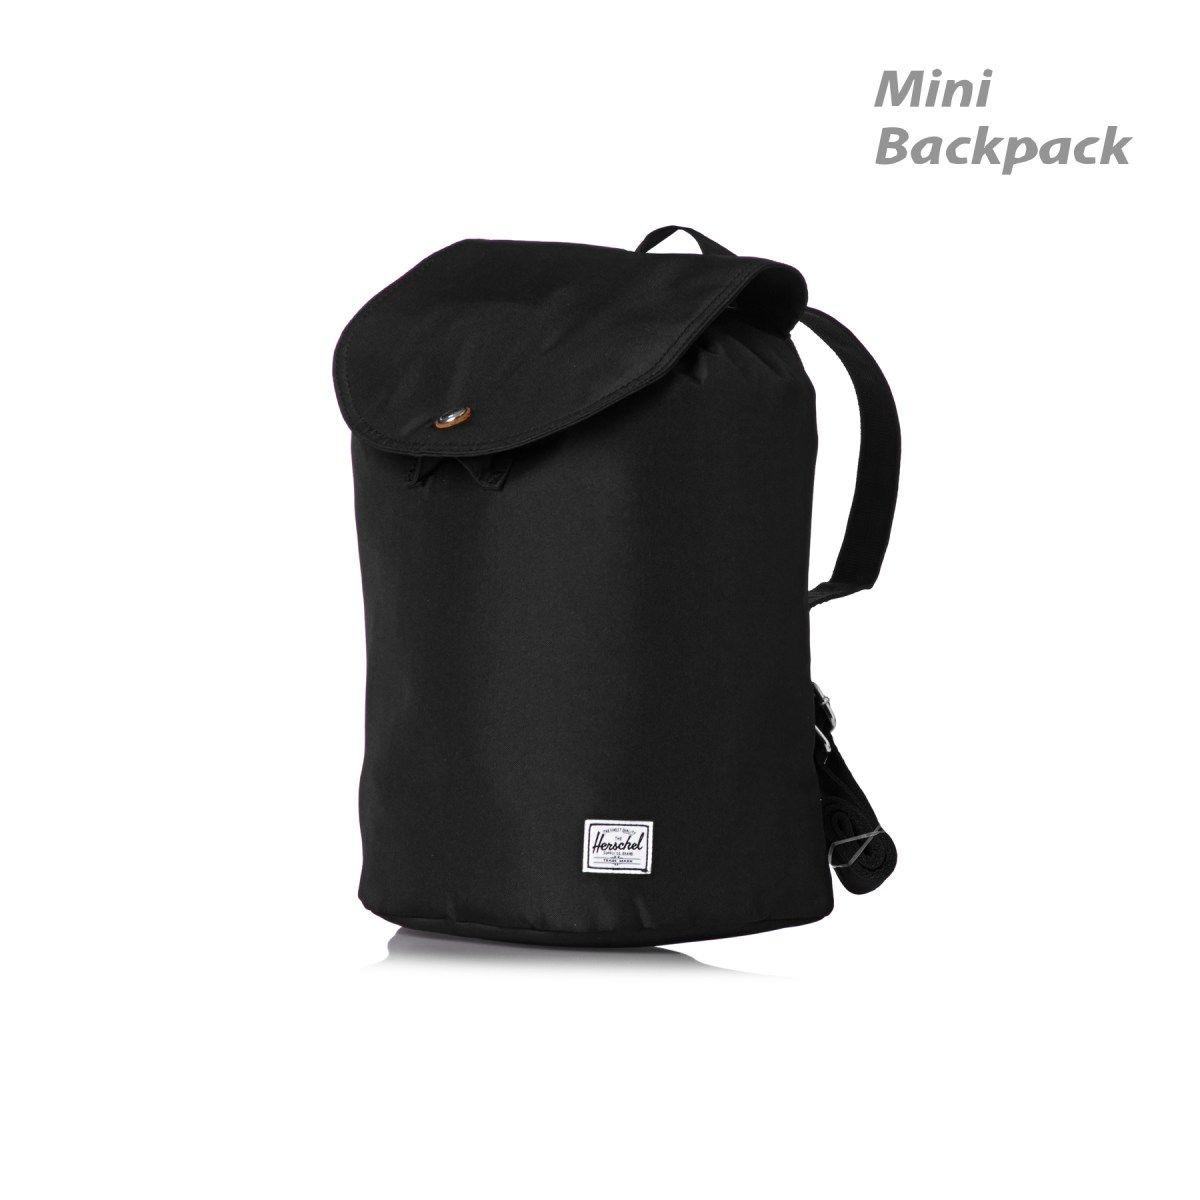 05db5648b90 Herschel Backpacks - Herschel Reid Womens Backpack - Black ...